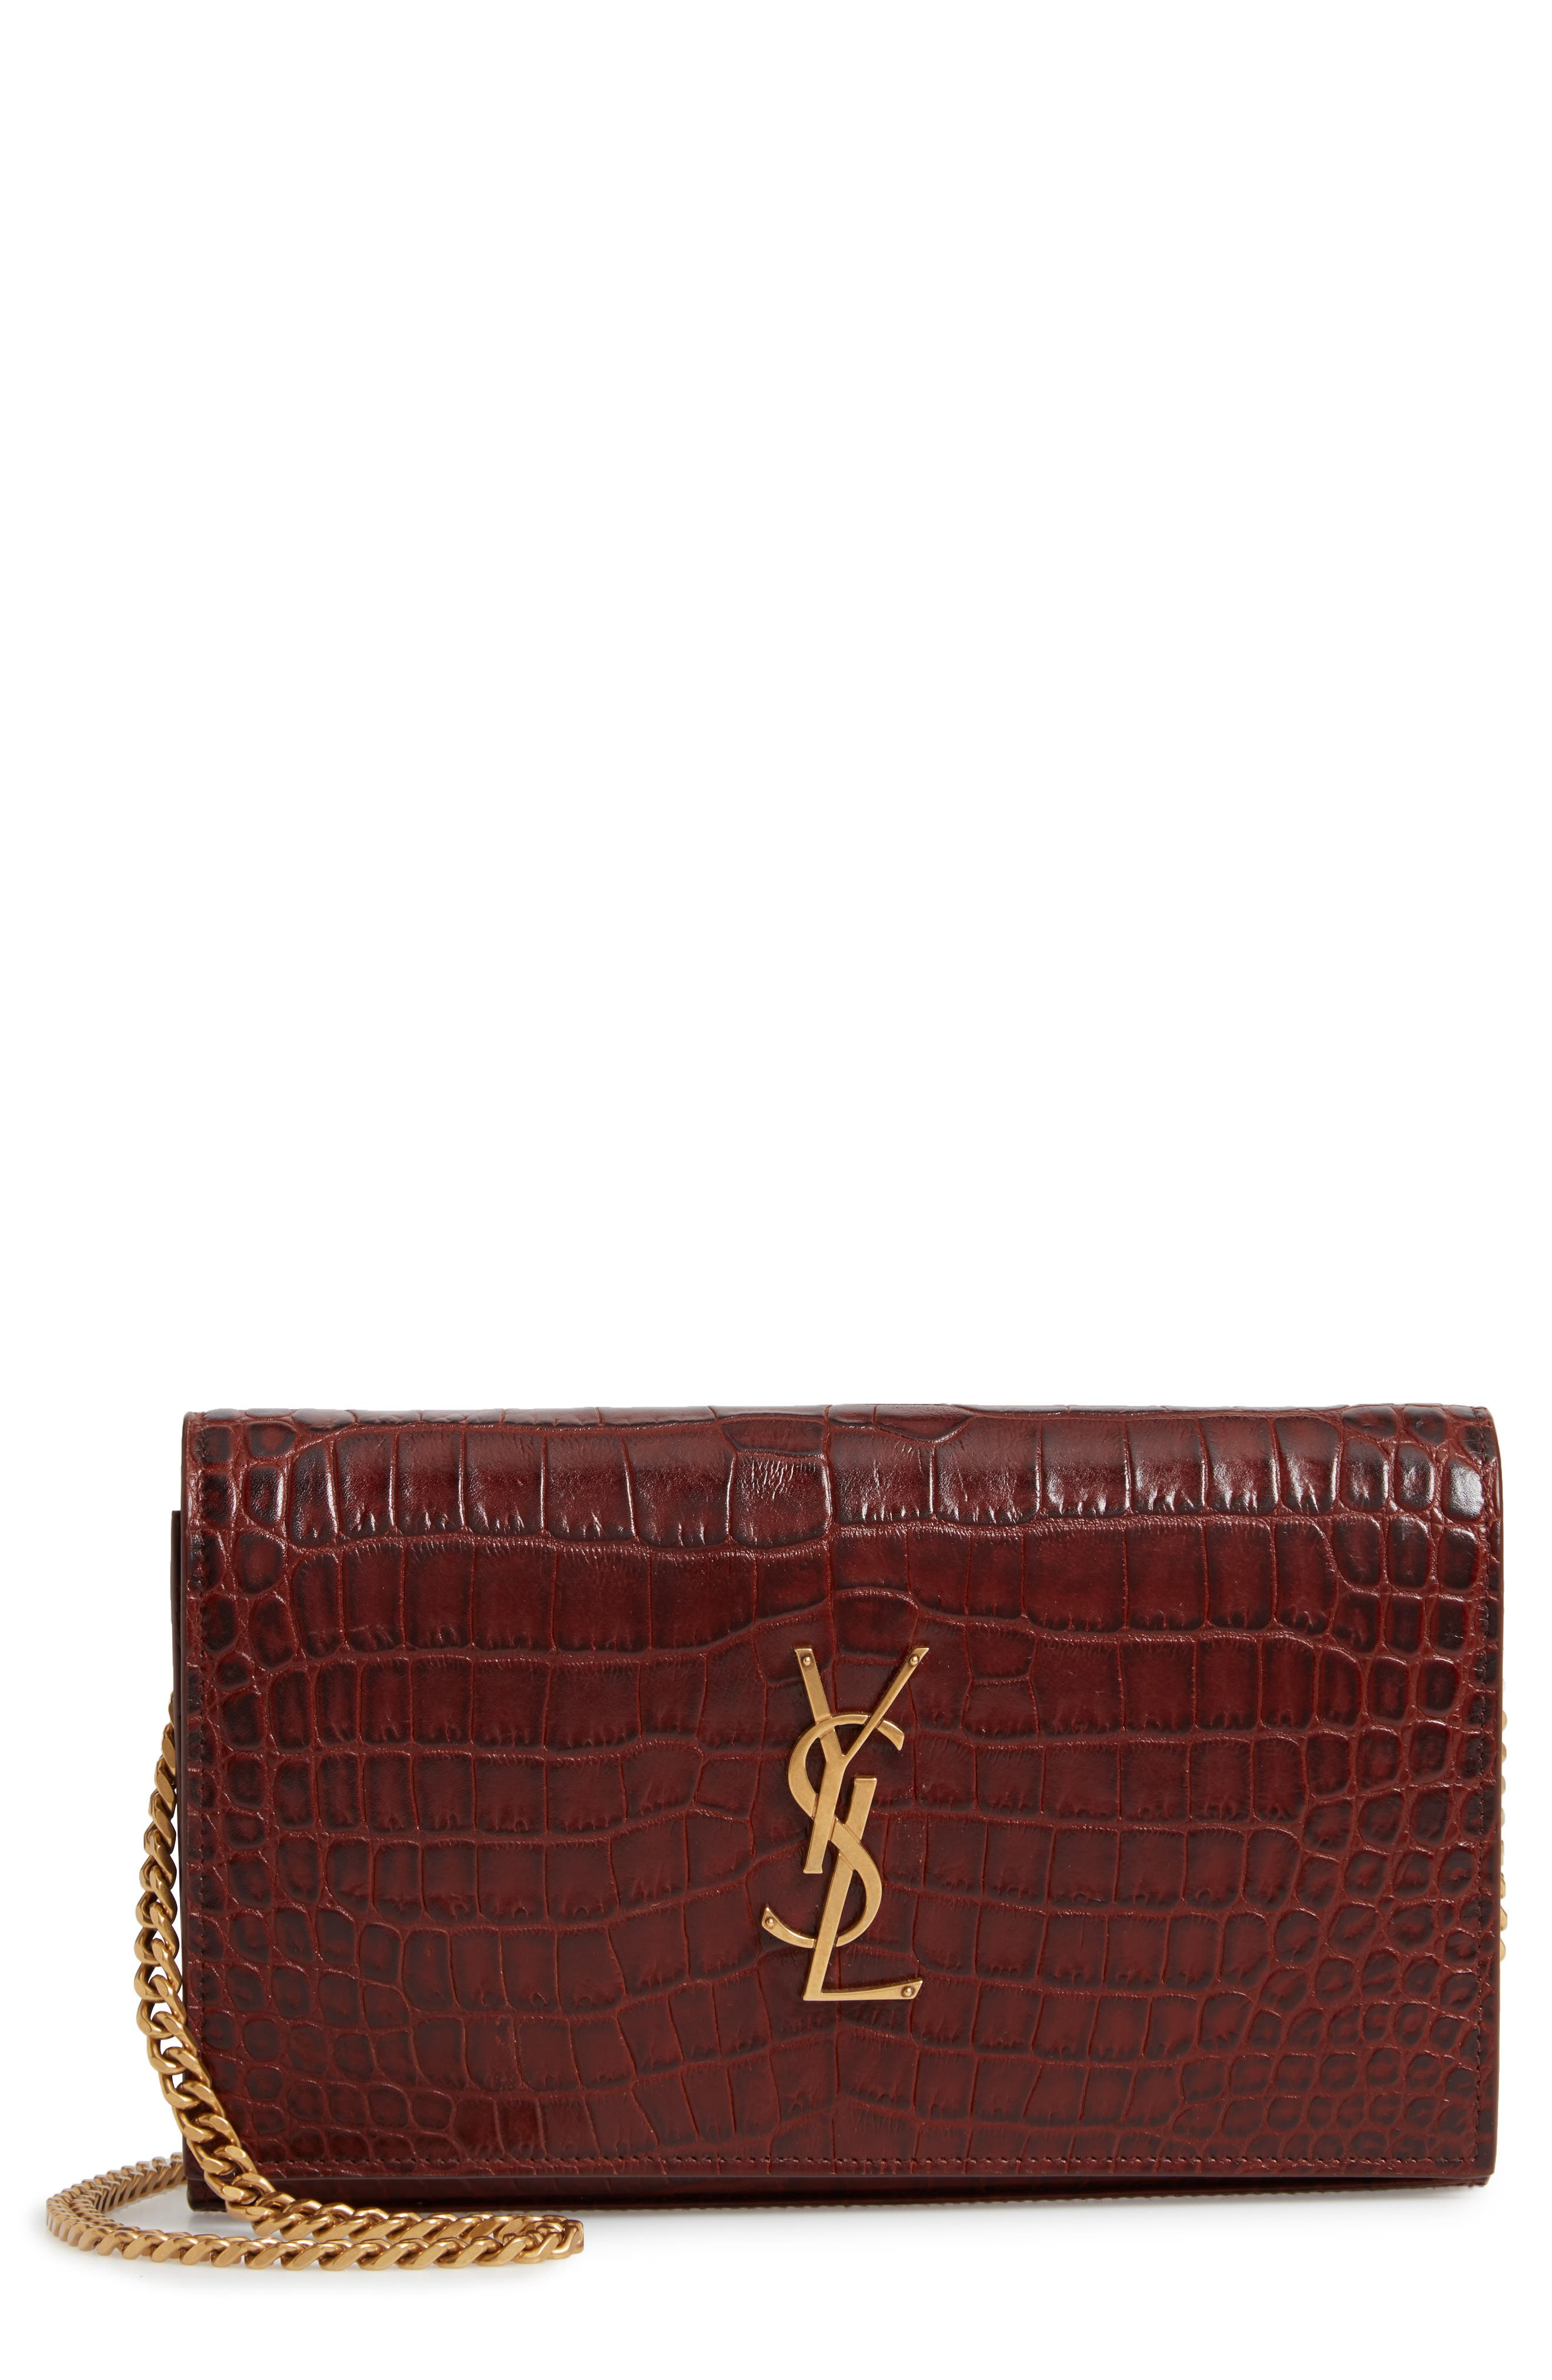 46a44dd8040d Women's Wallets Designer Wallets & Accessories | Nordstrom